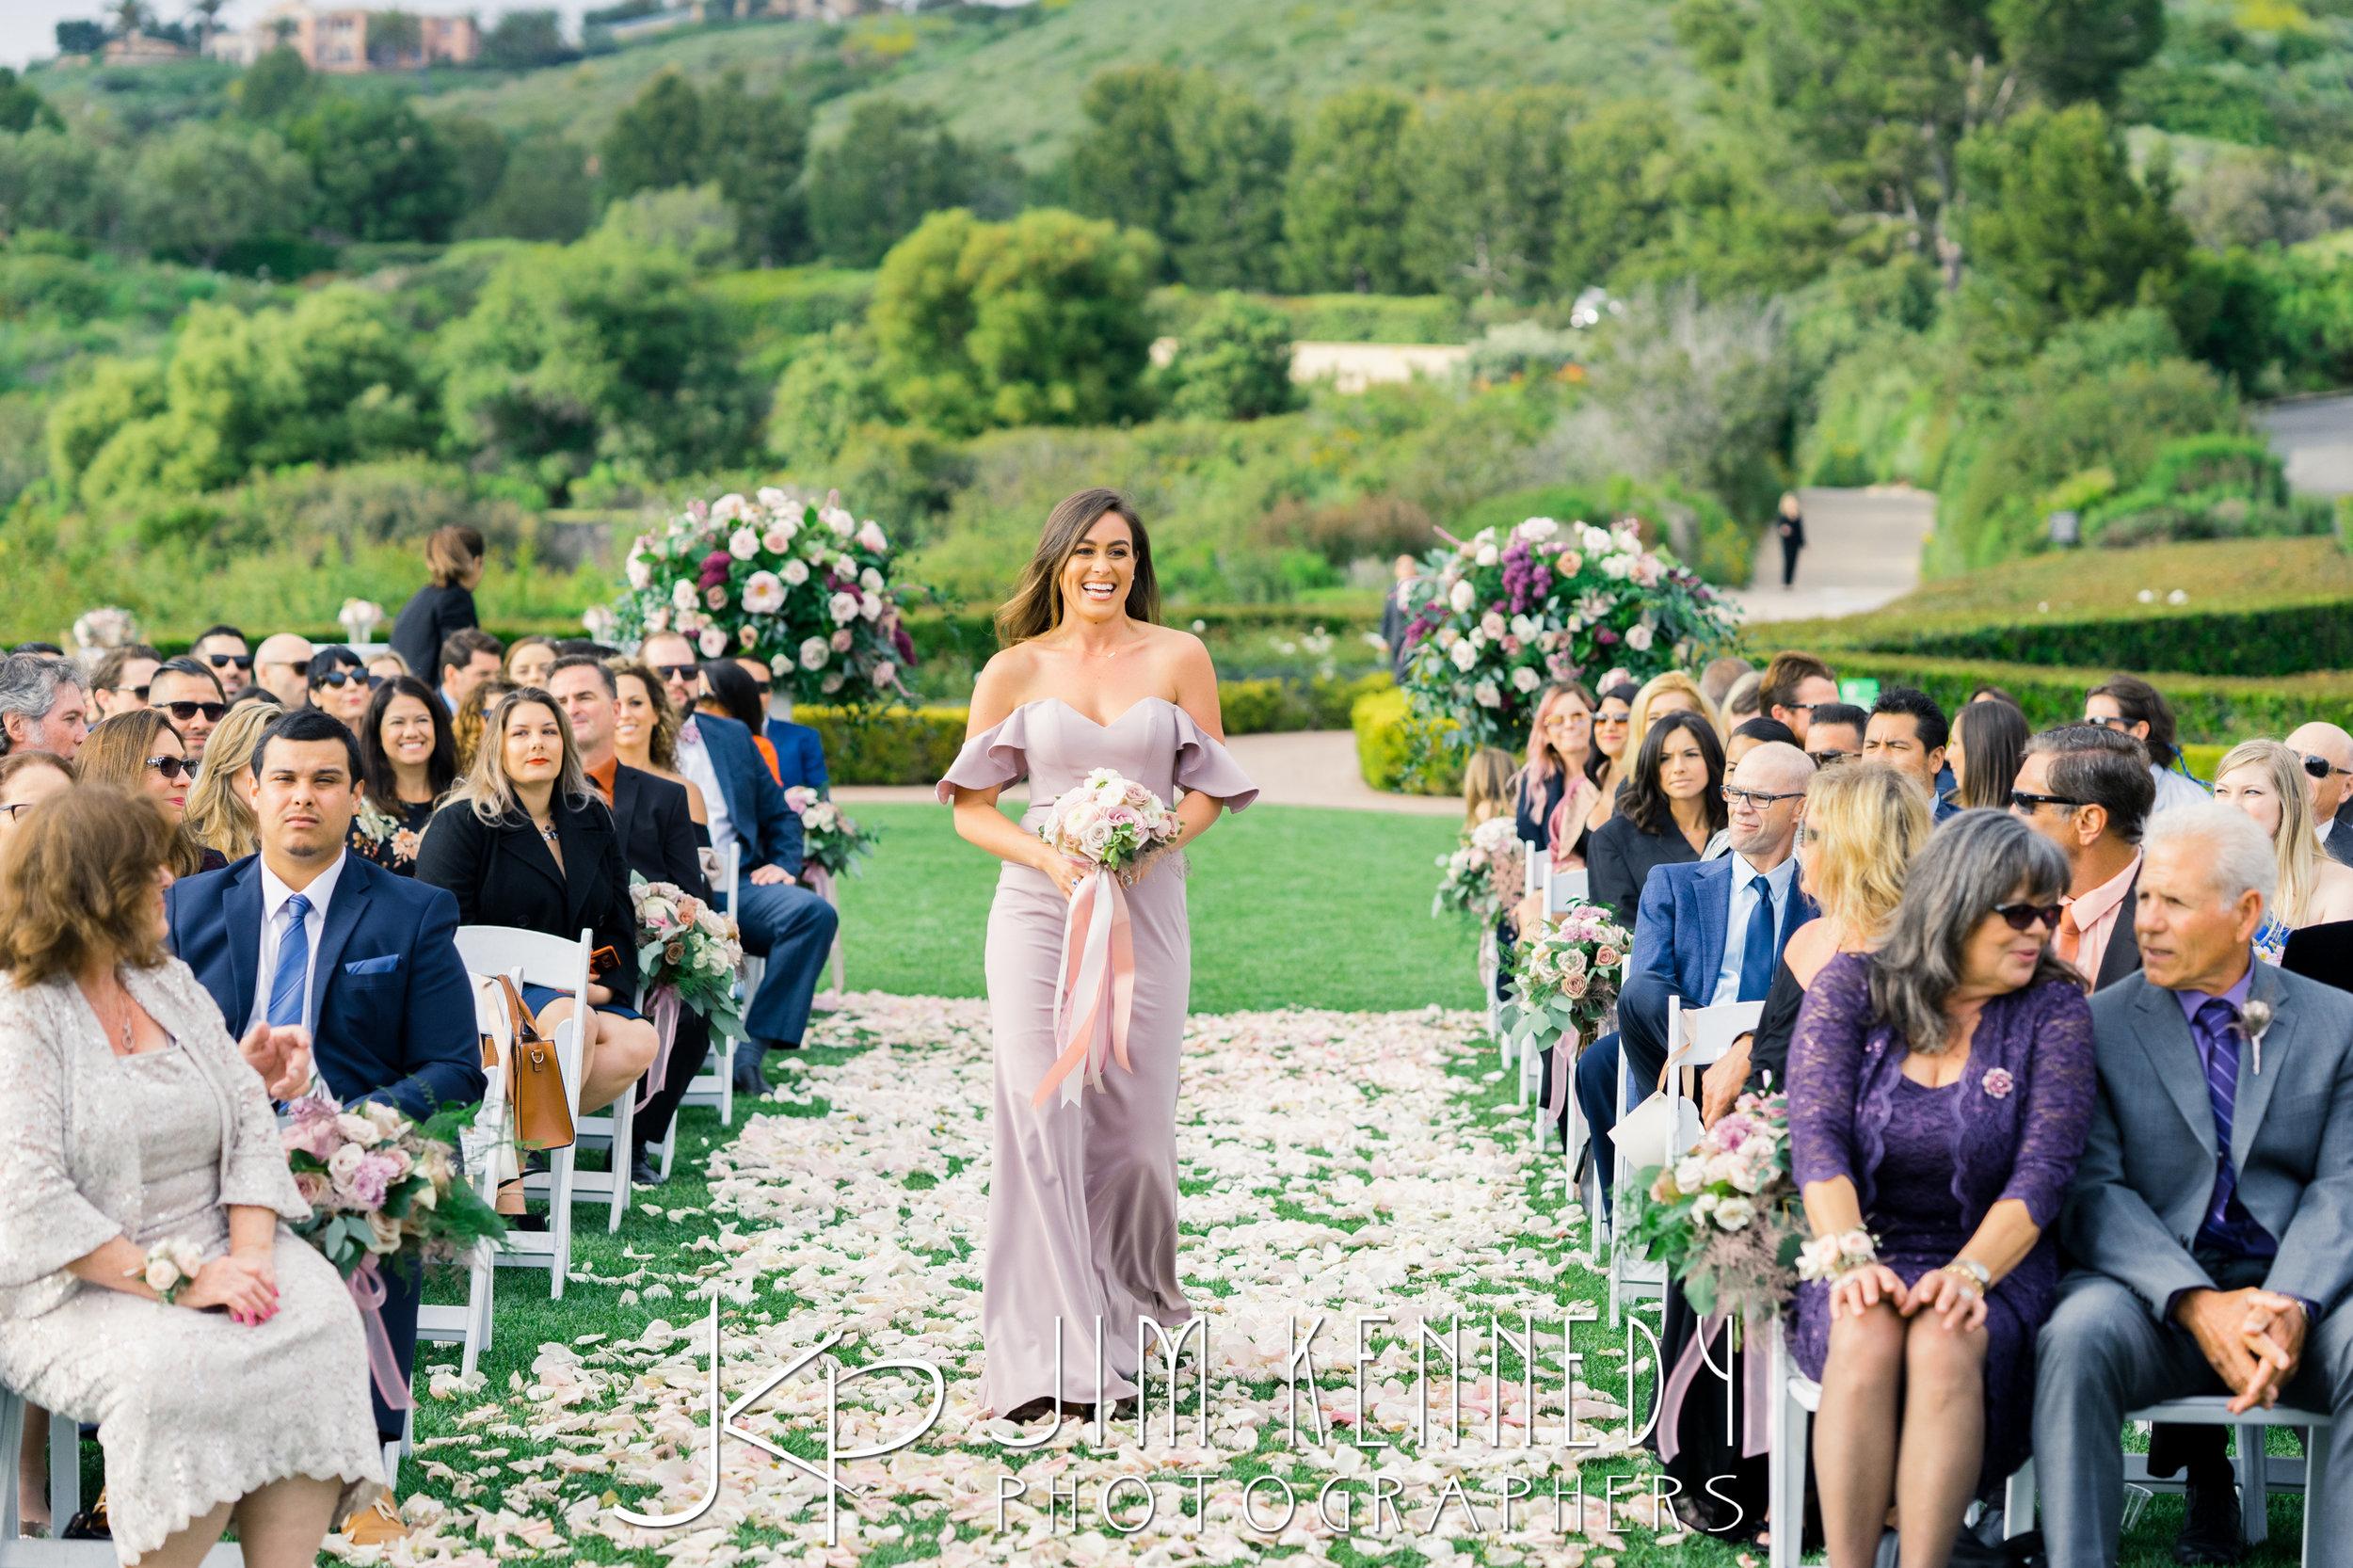 pelican-hill-wedding-jim-kenedy-photographers_0105.JPG